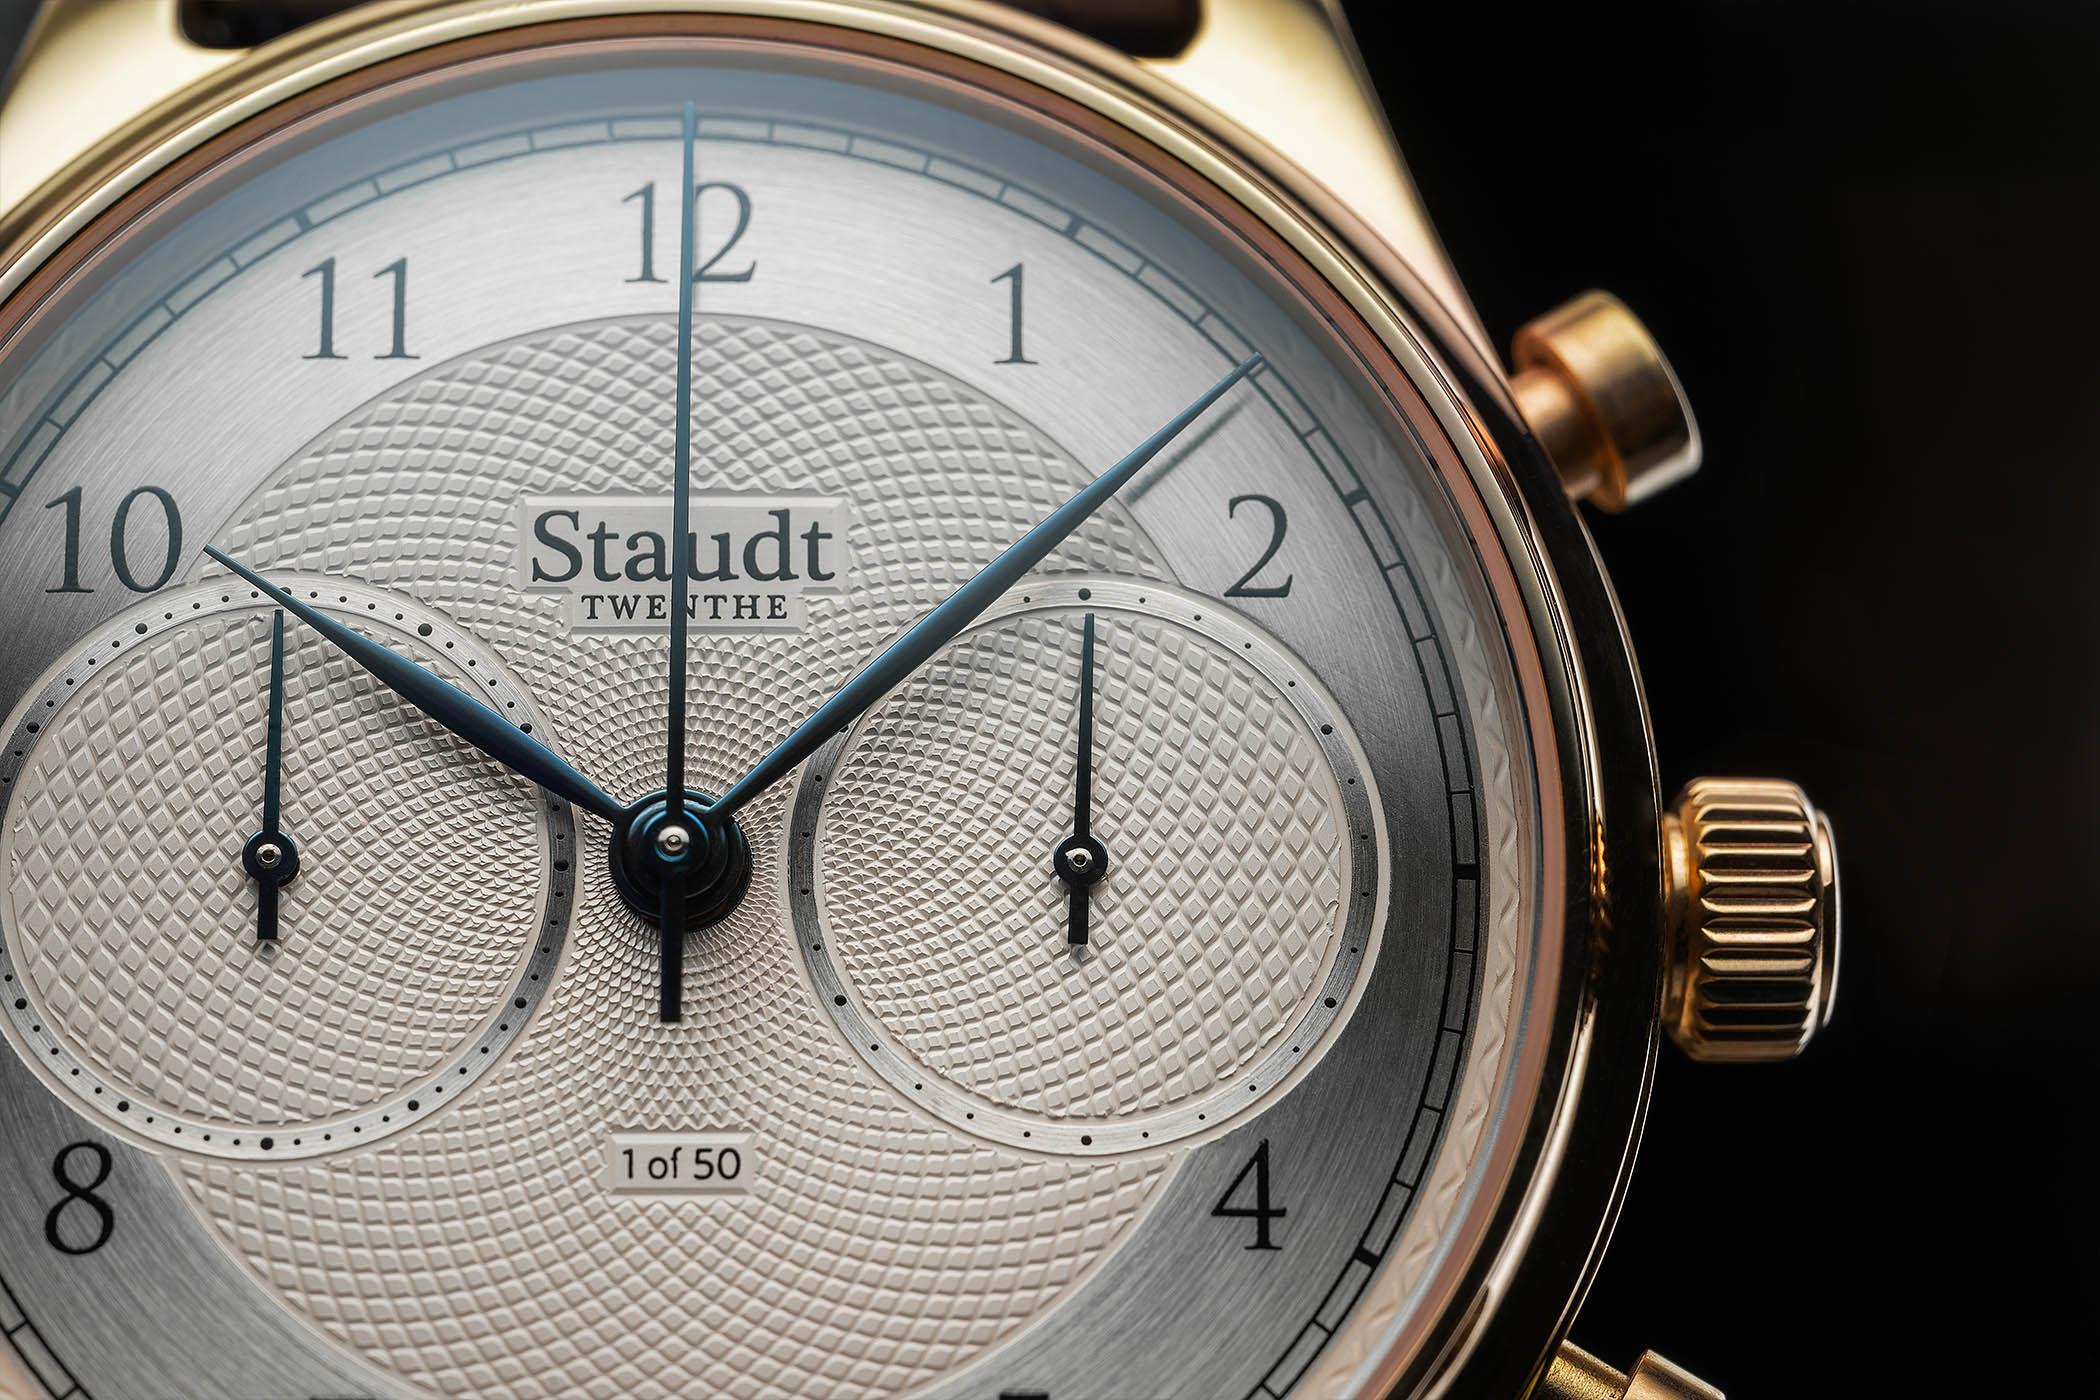 Staudt Guilloche Chronograph watch - 10